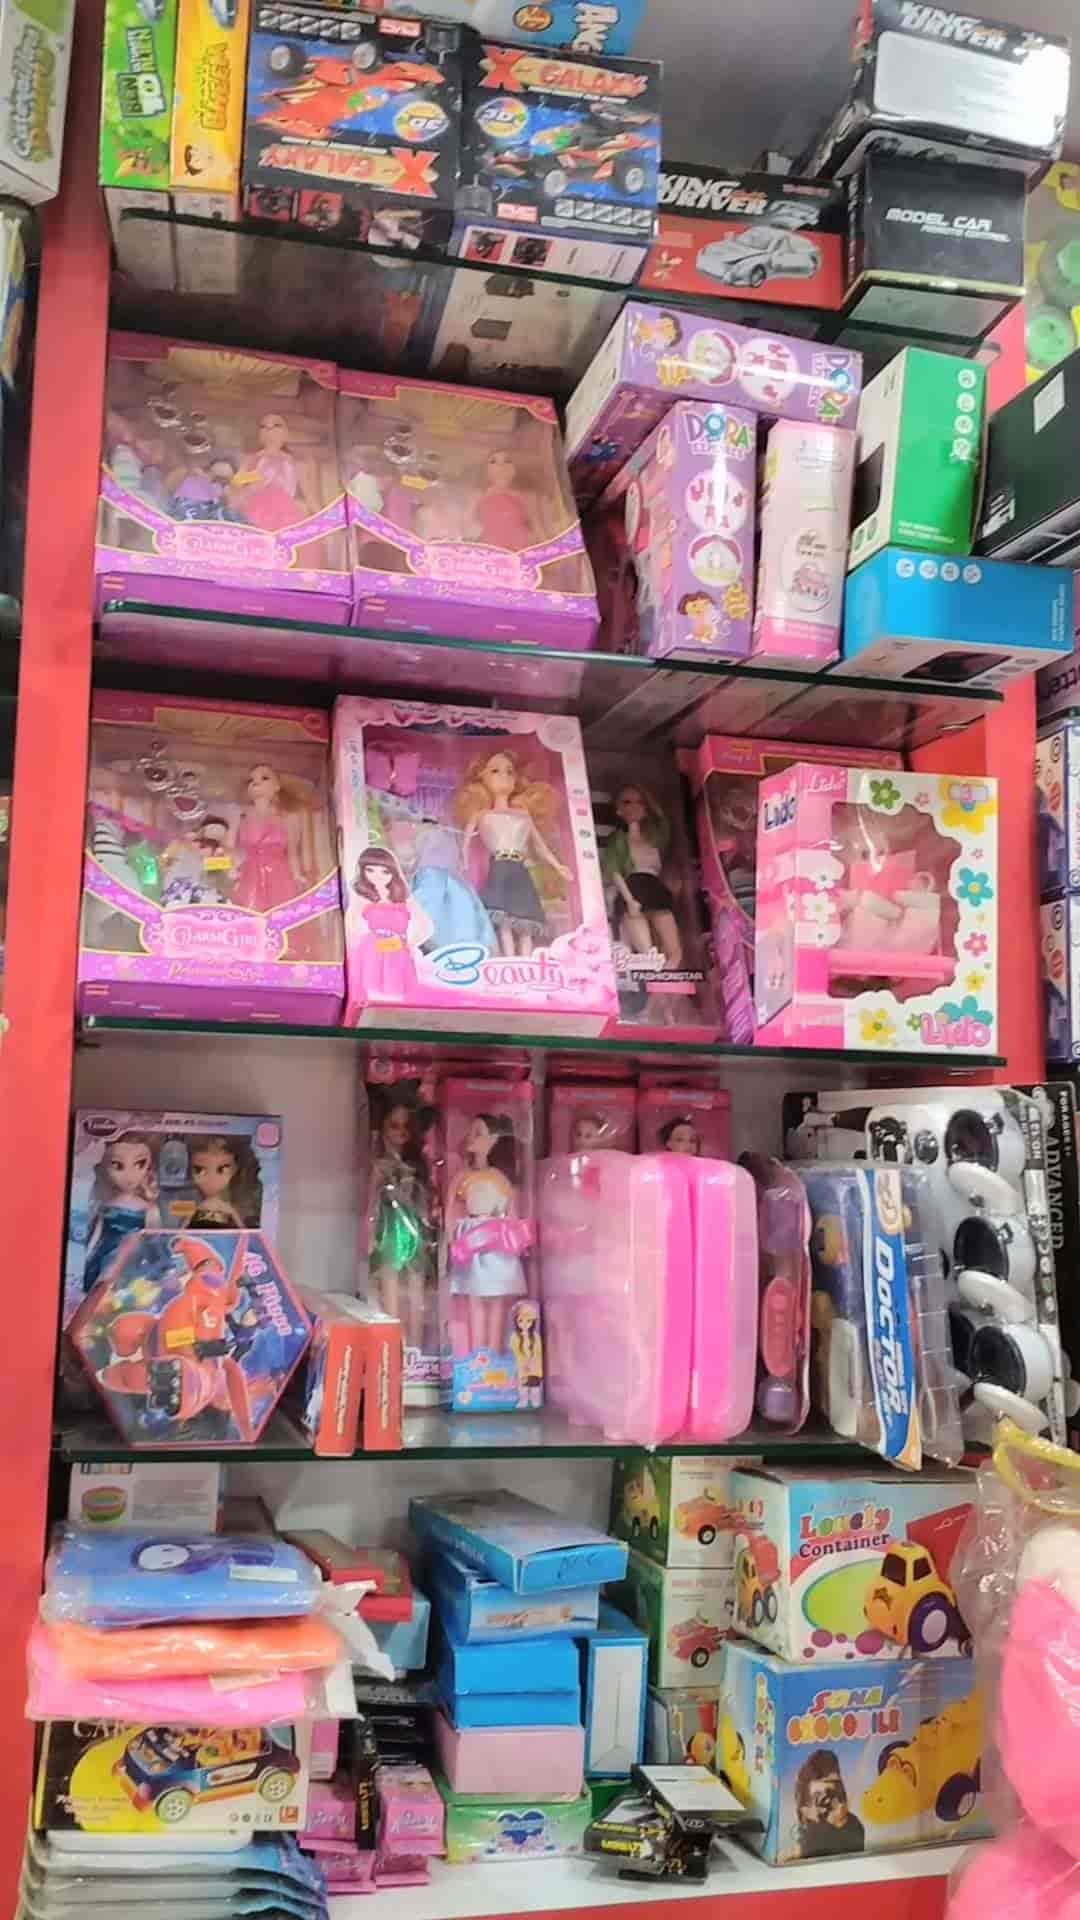 Galaxy Gift And Toys, Indira Nagar - Galaxy Gift & Toys - Gift Shops ...